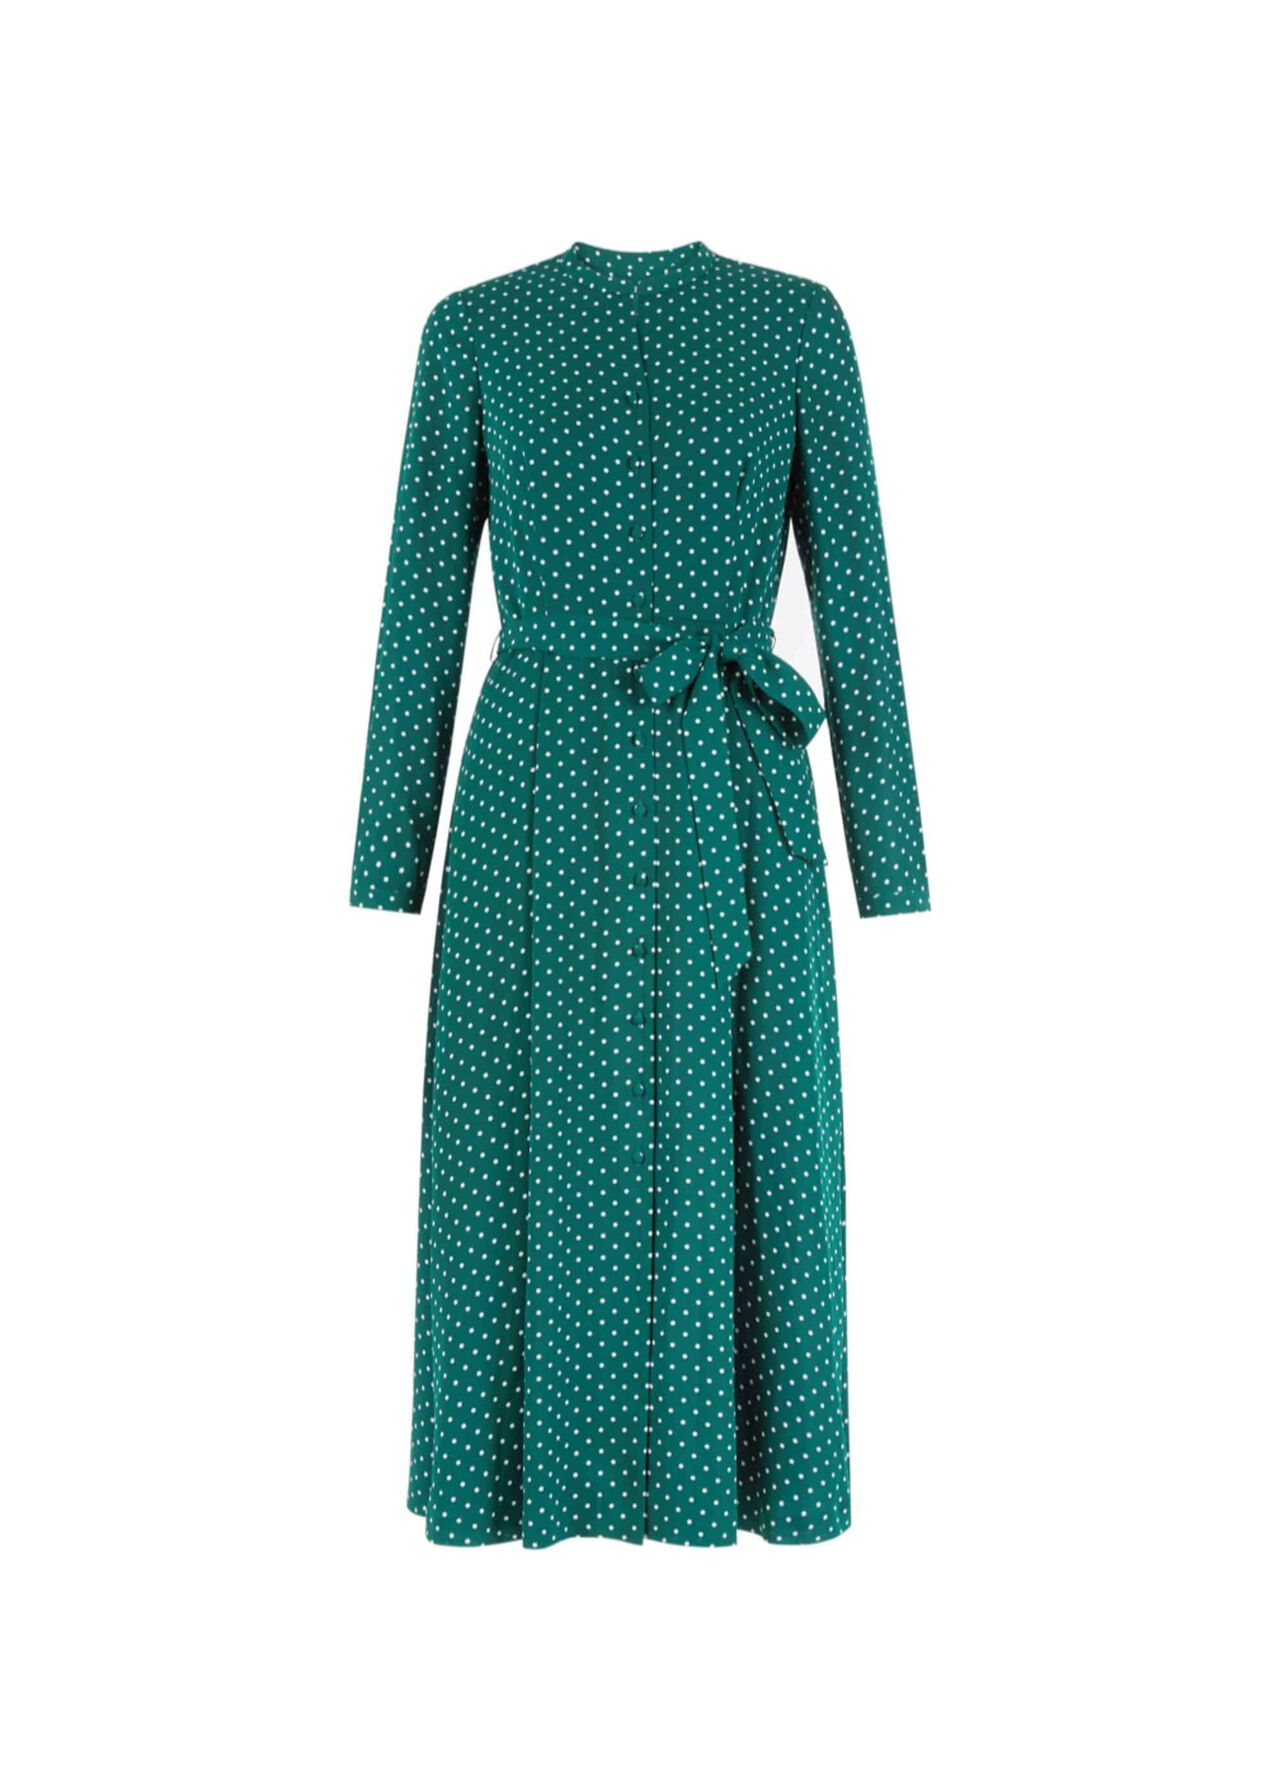 Tarini Dress Green Ivory